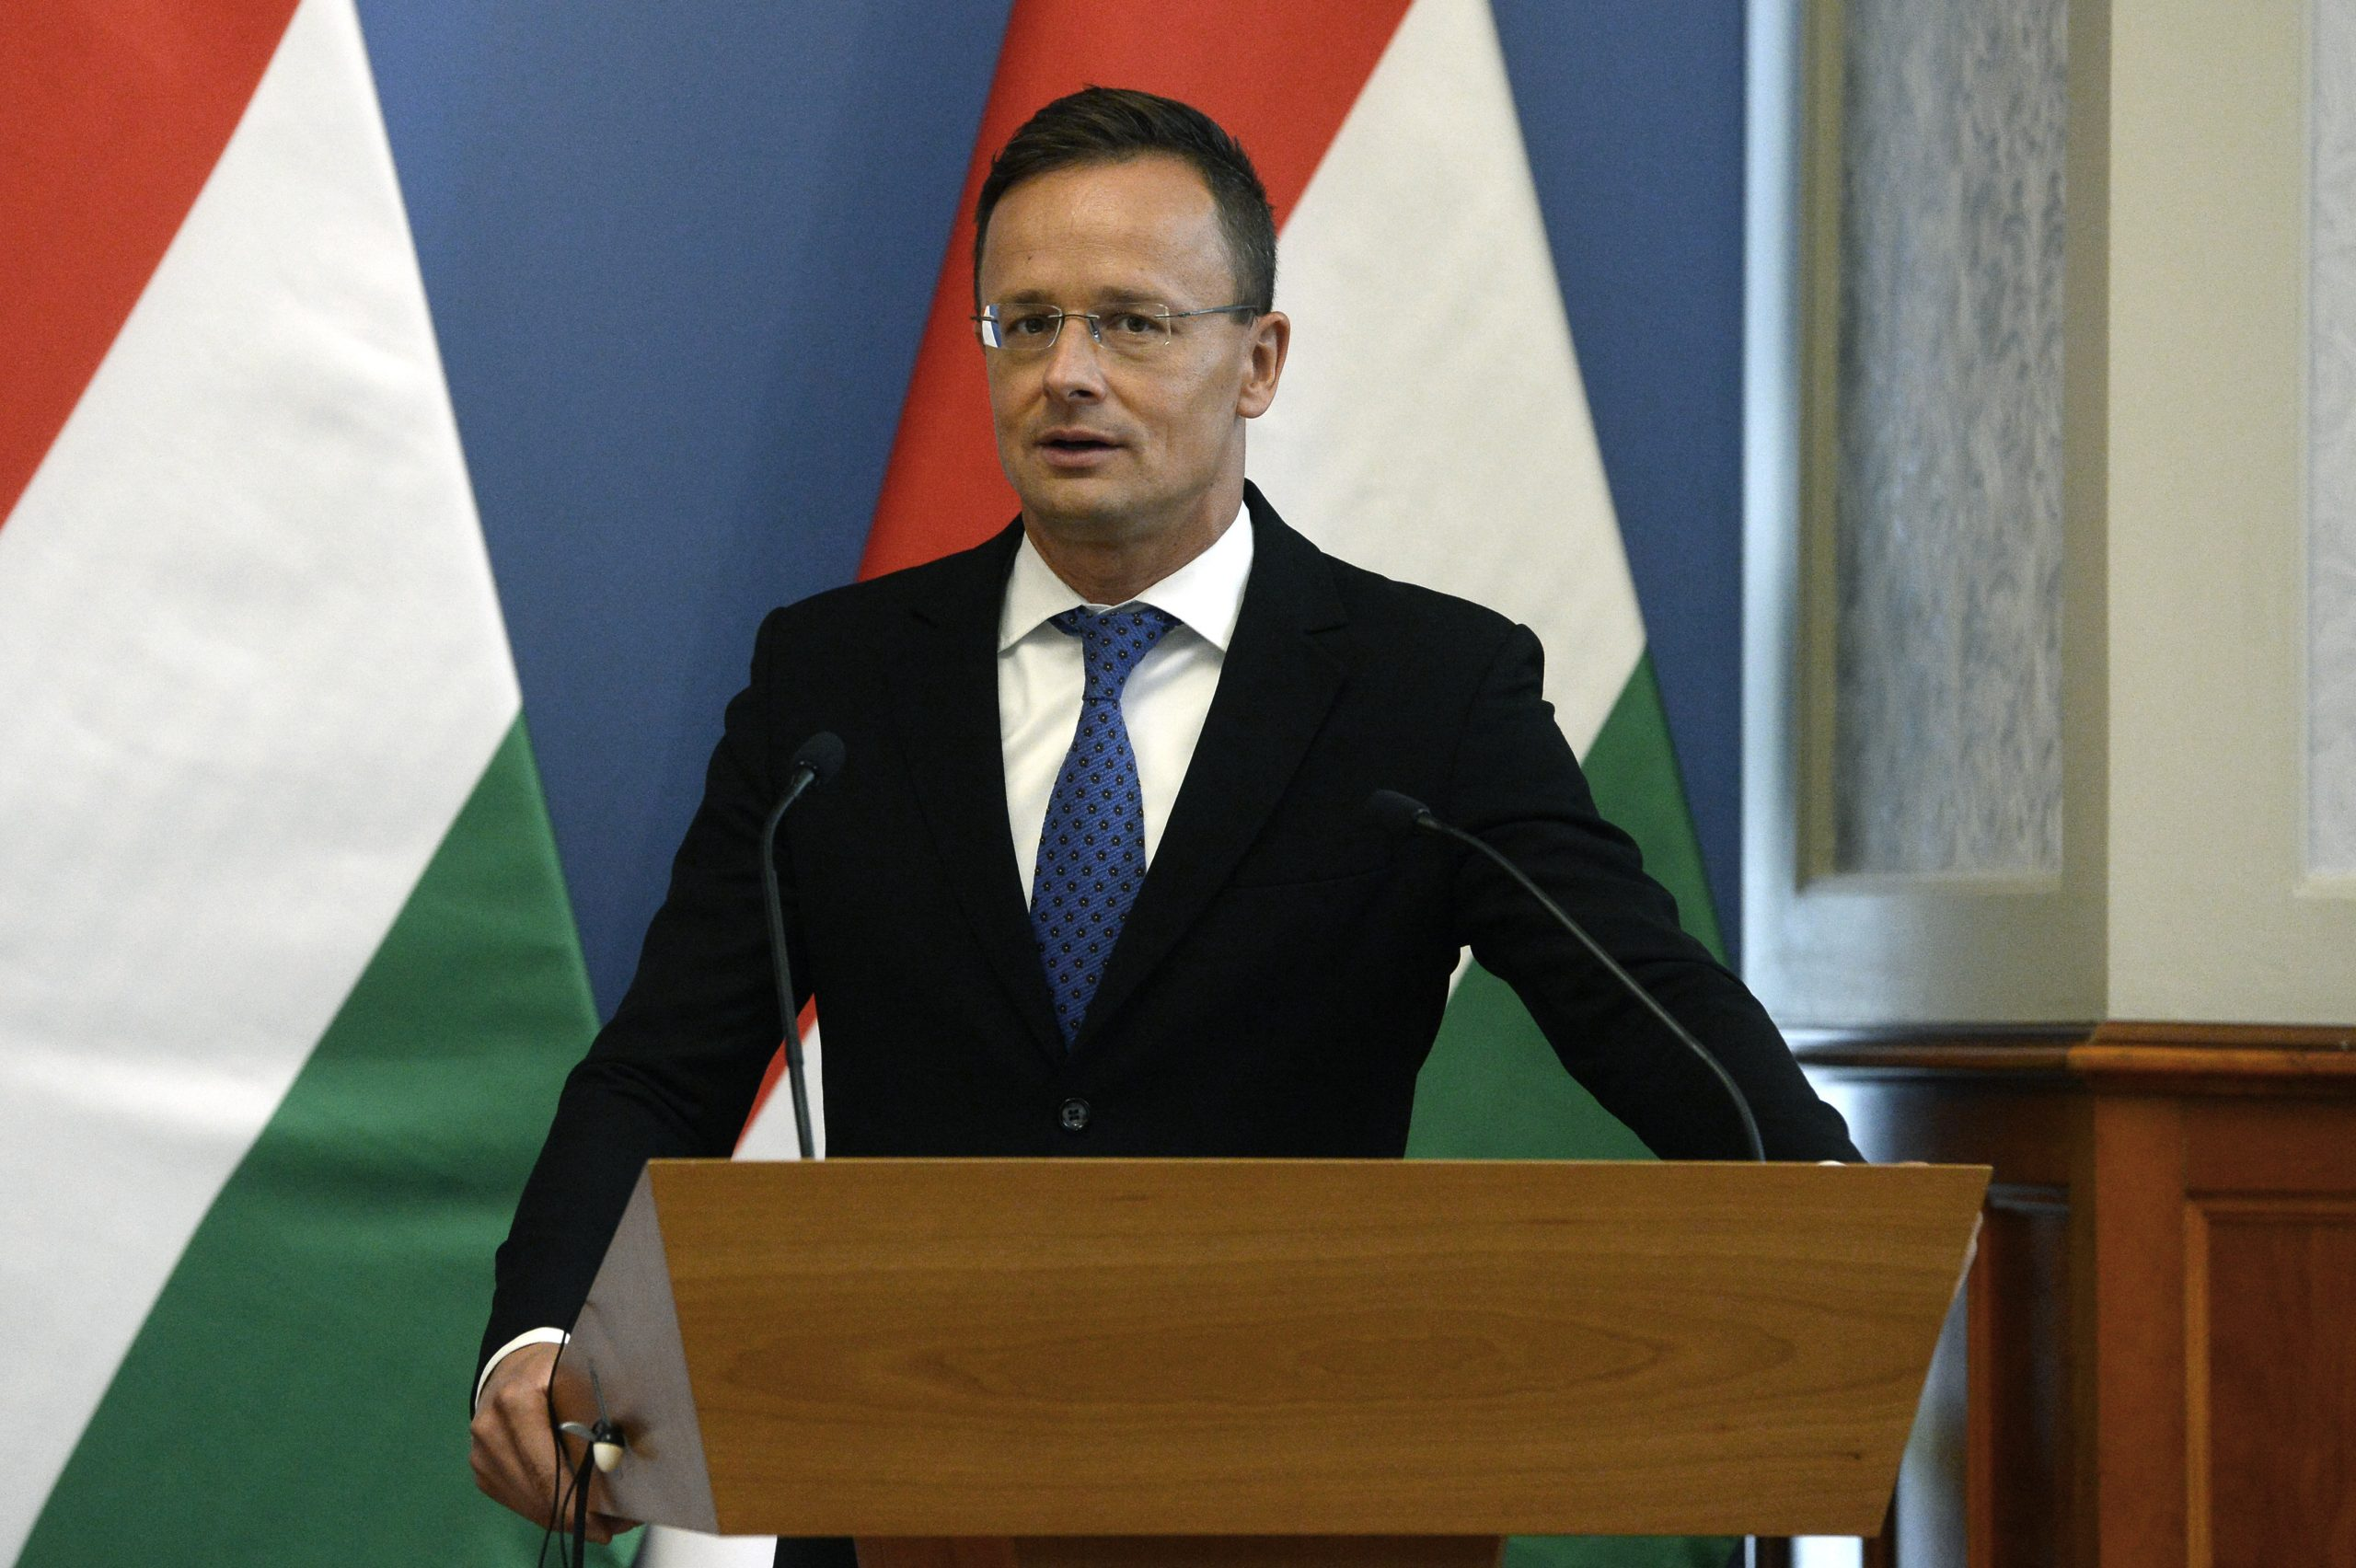 Szijjártó: Europe Less Secure, Weaker Without V4